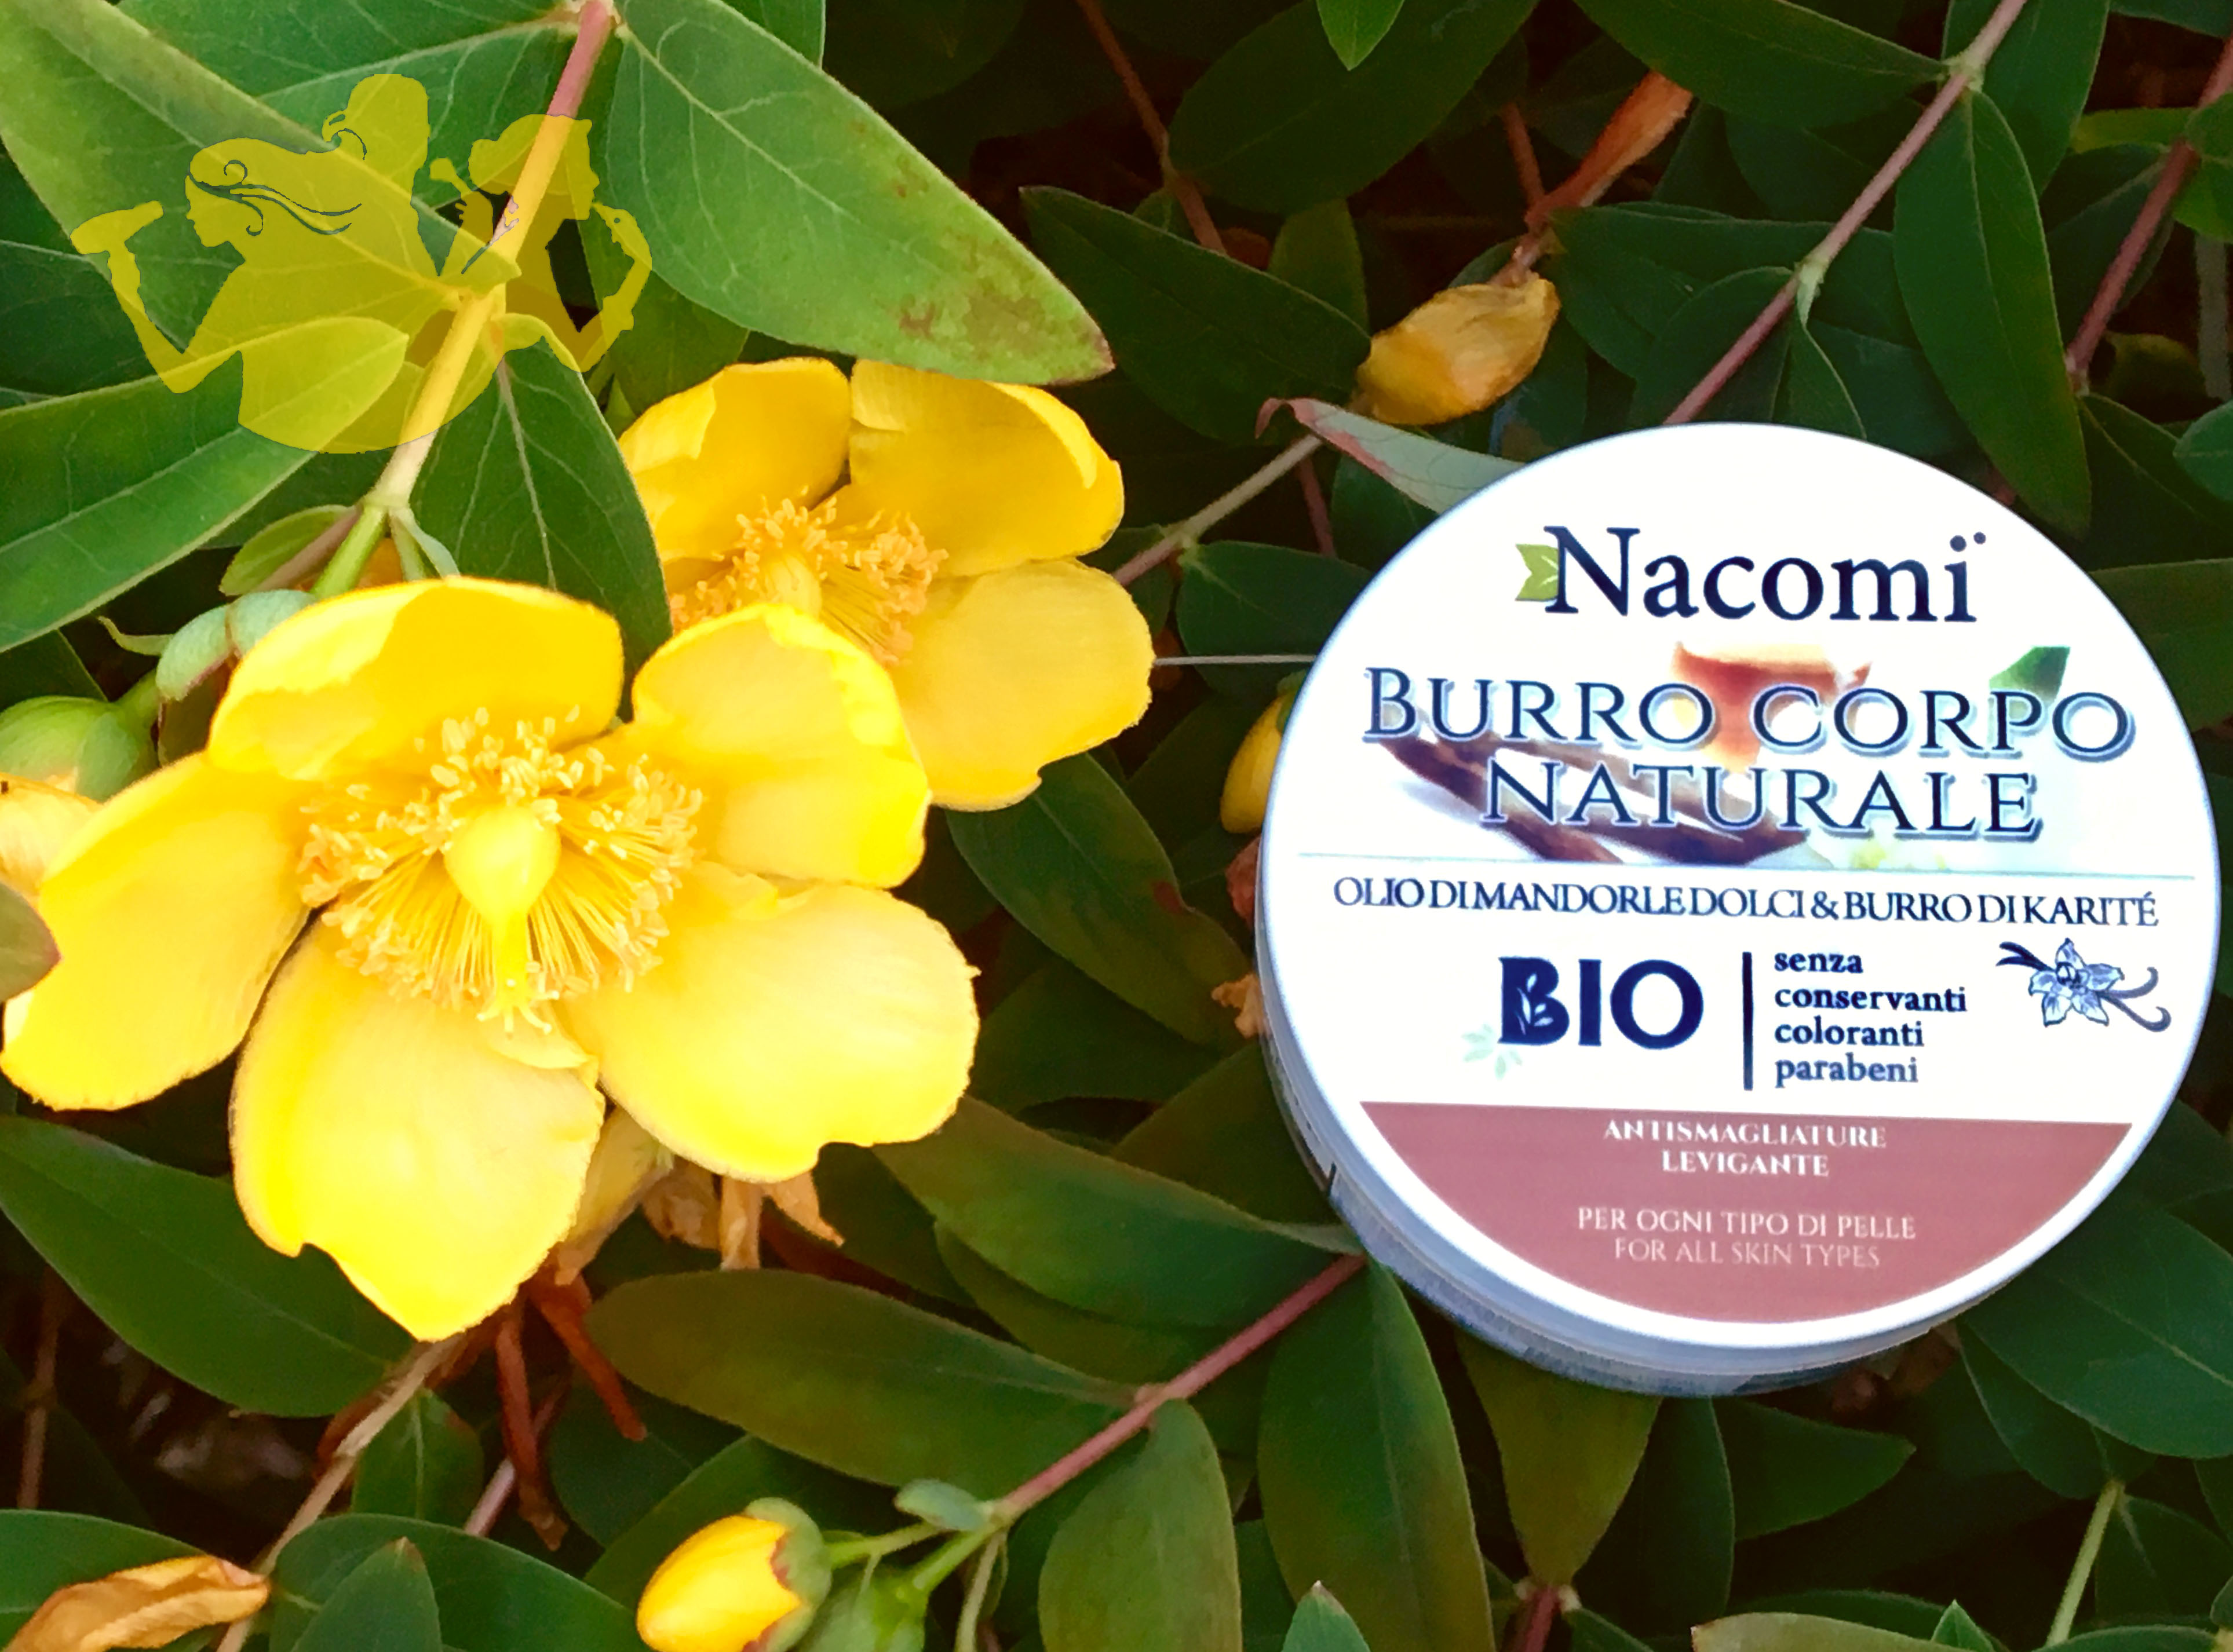 Burro corpo naturale, Nacomi